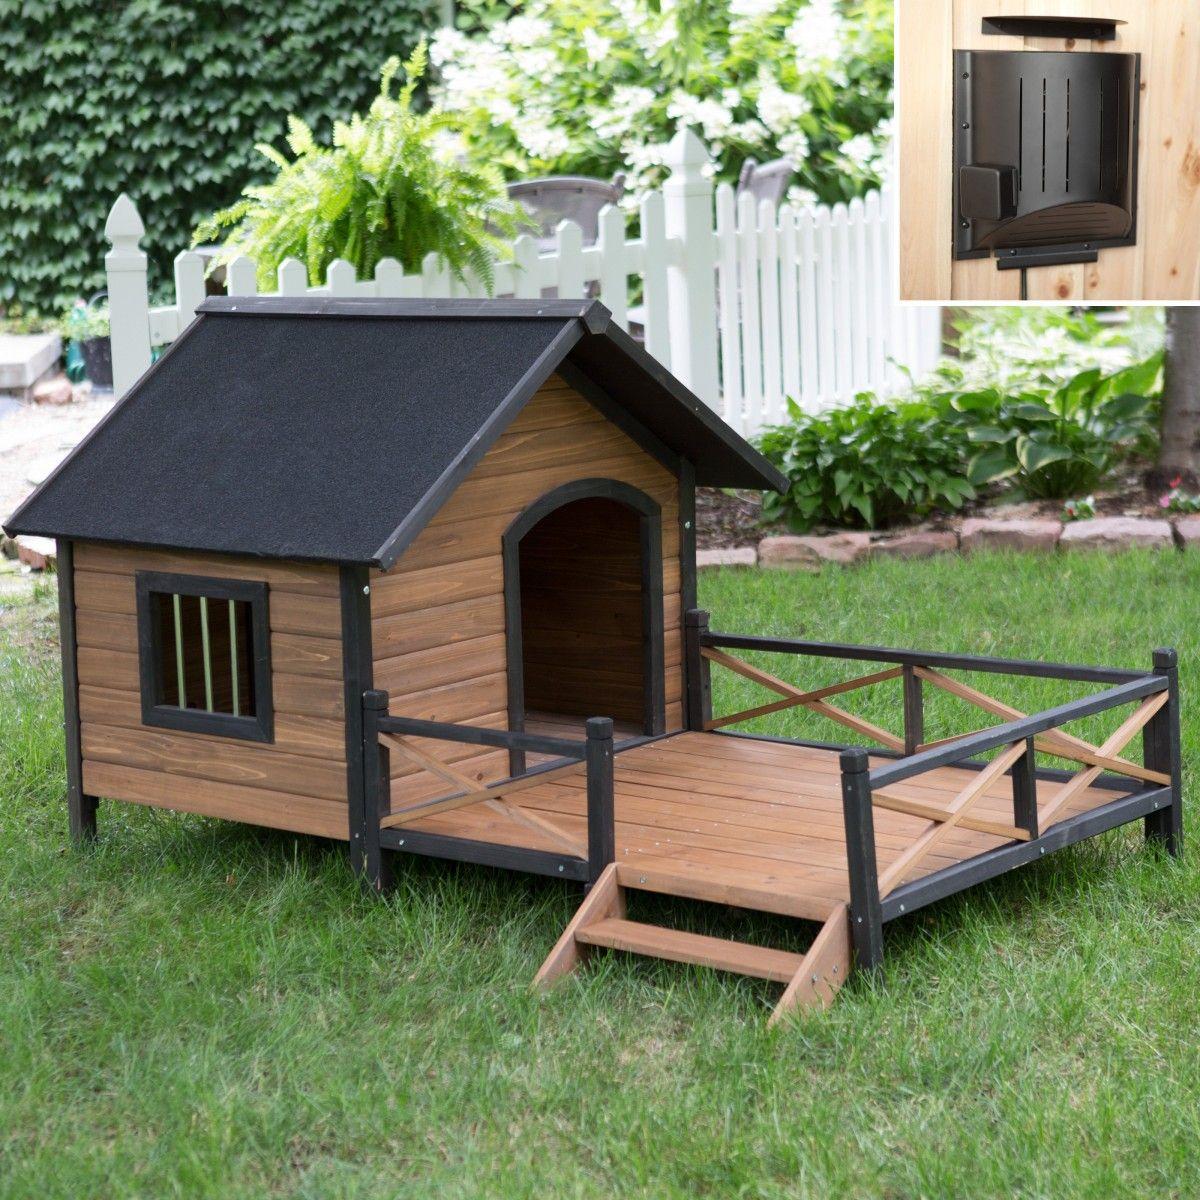 House Dog Plans 19